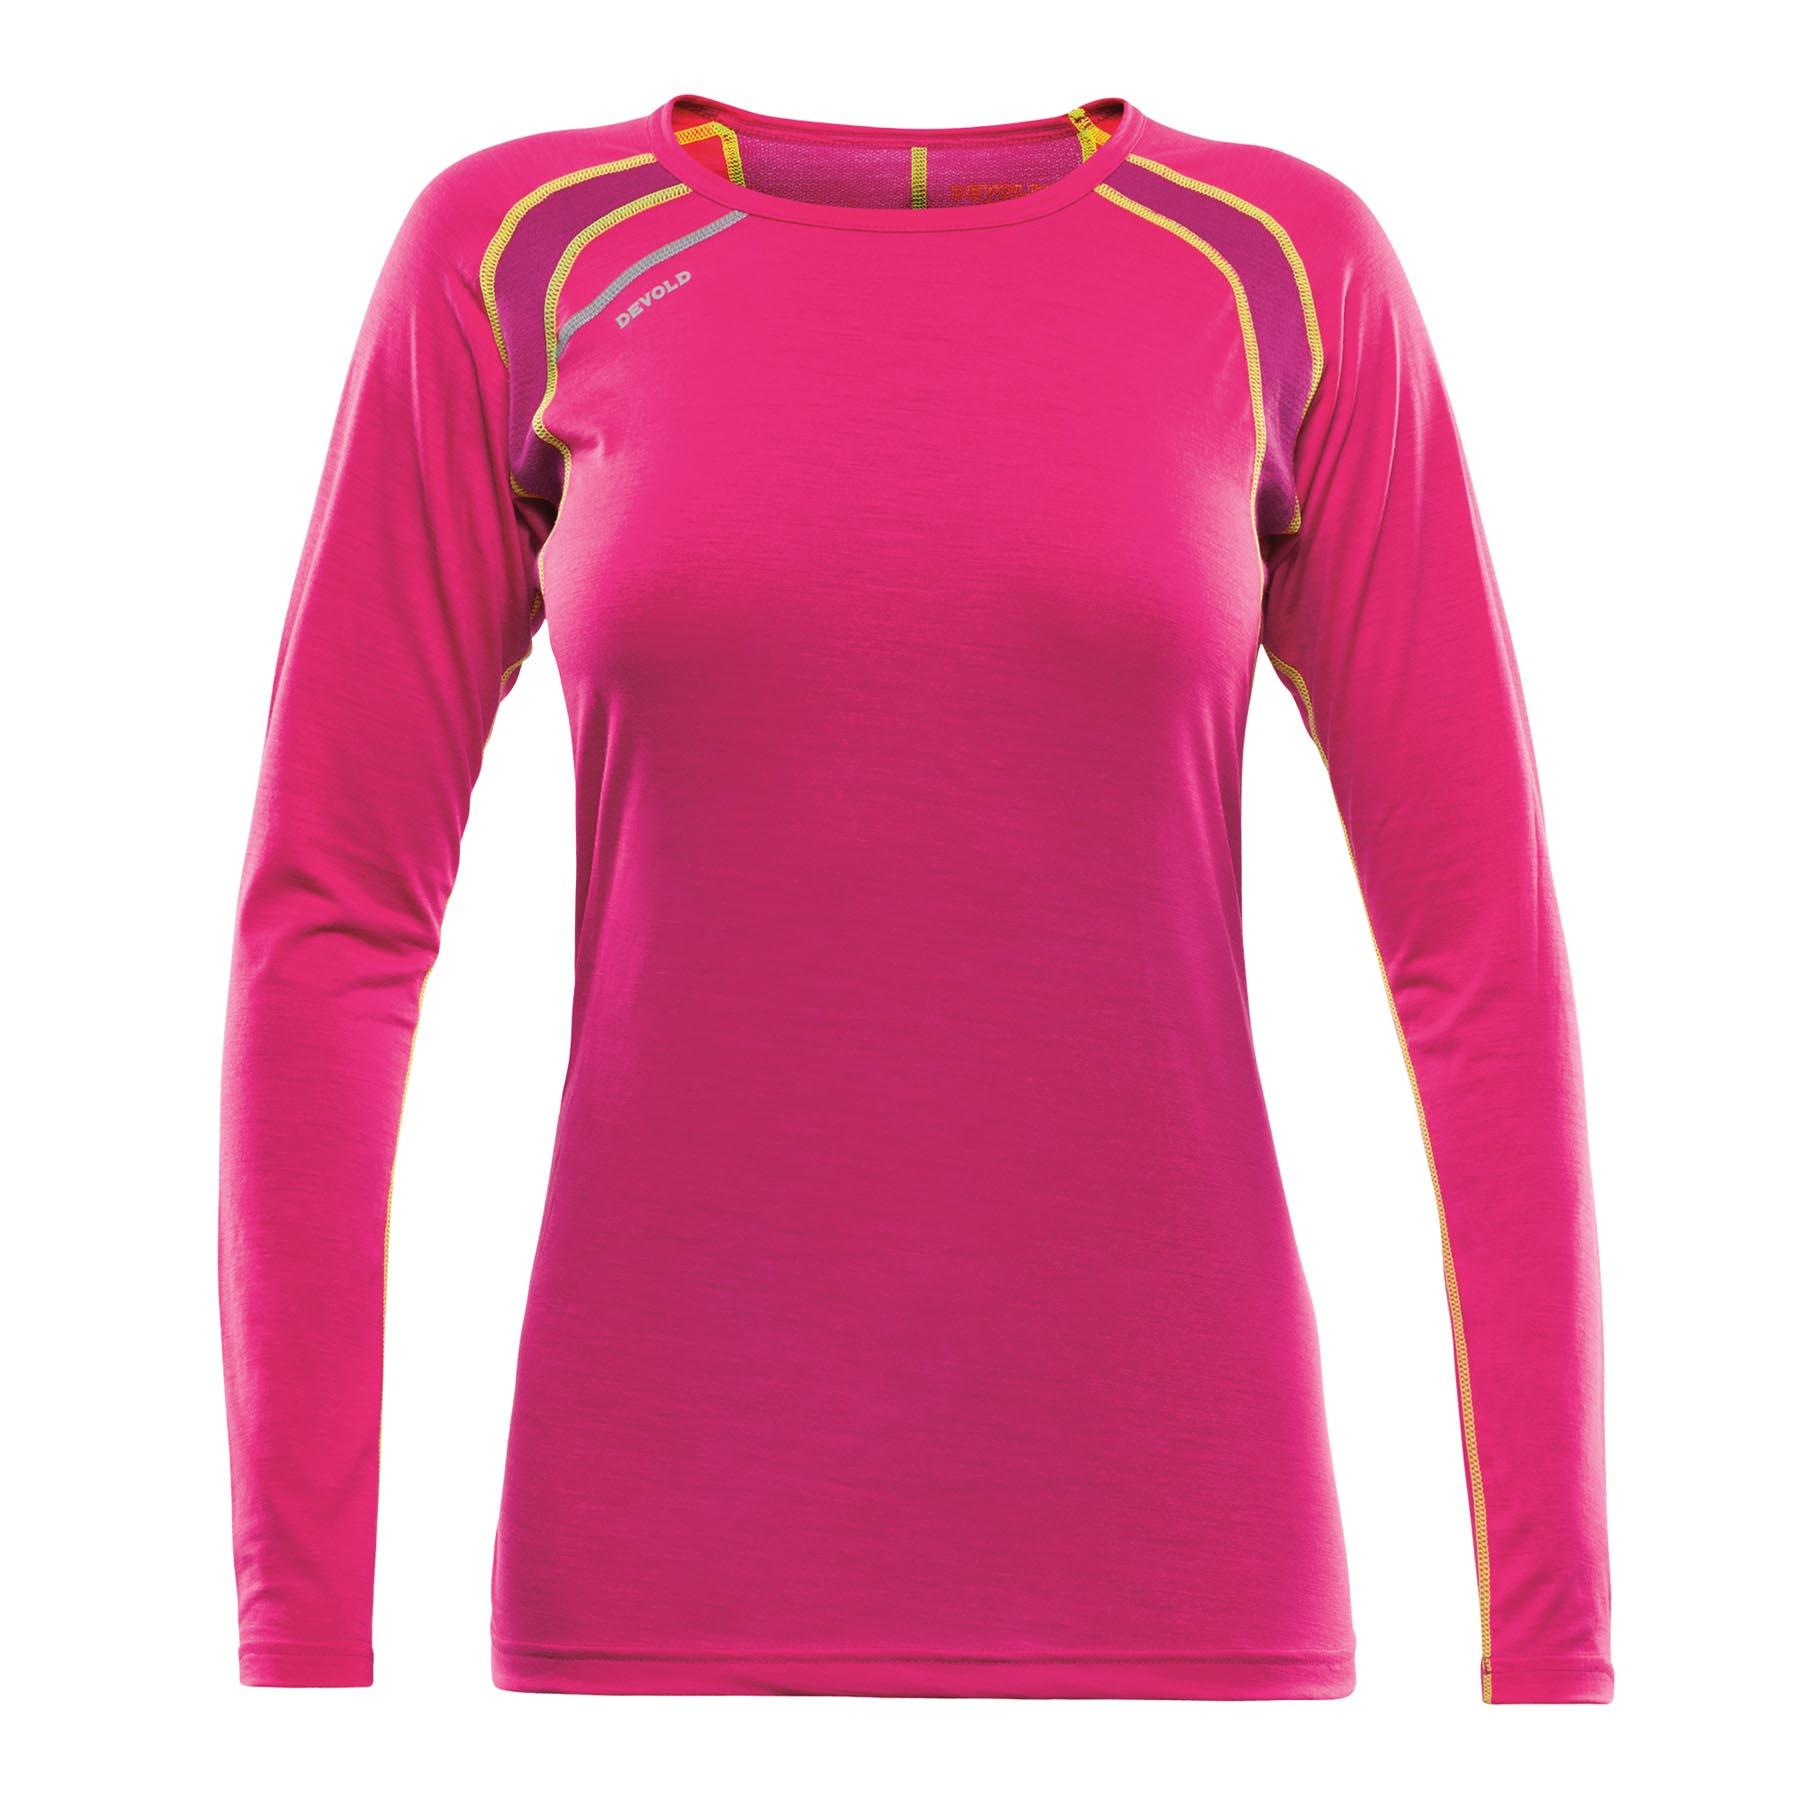 Devold triko Energy woman shirt Velikost: S